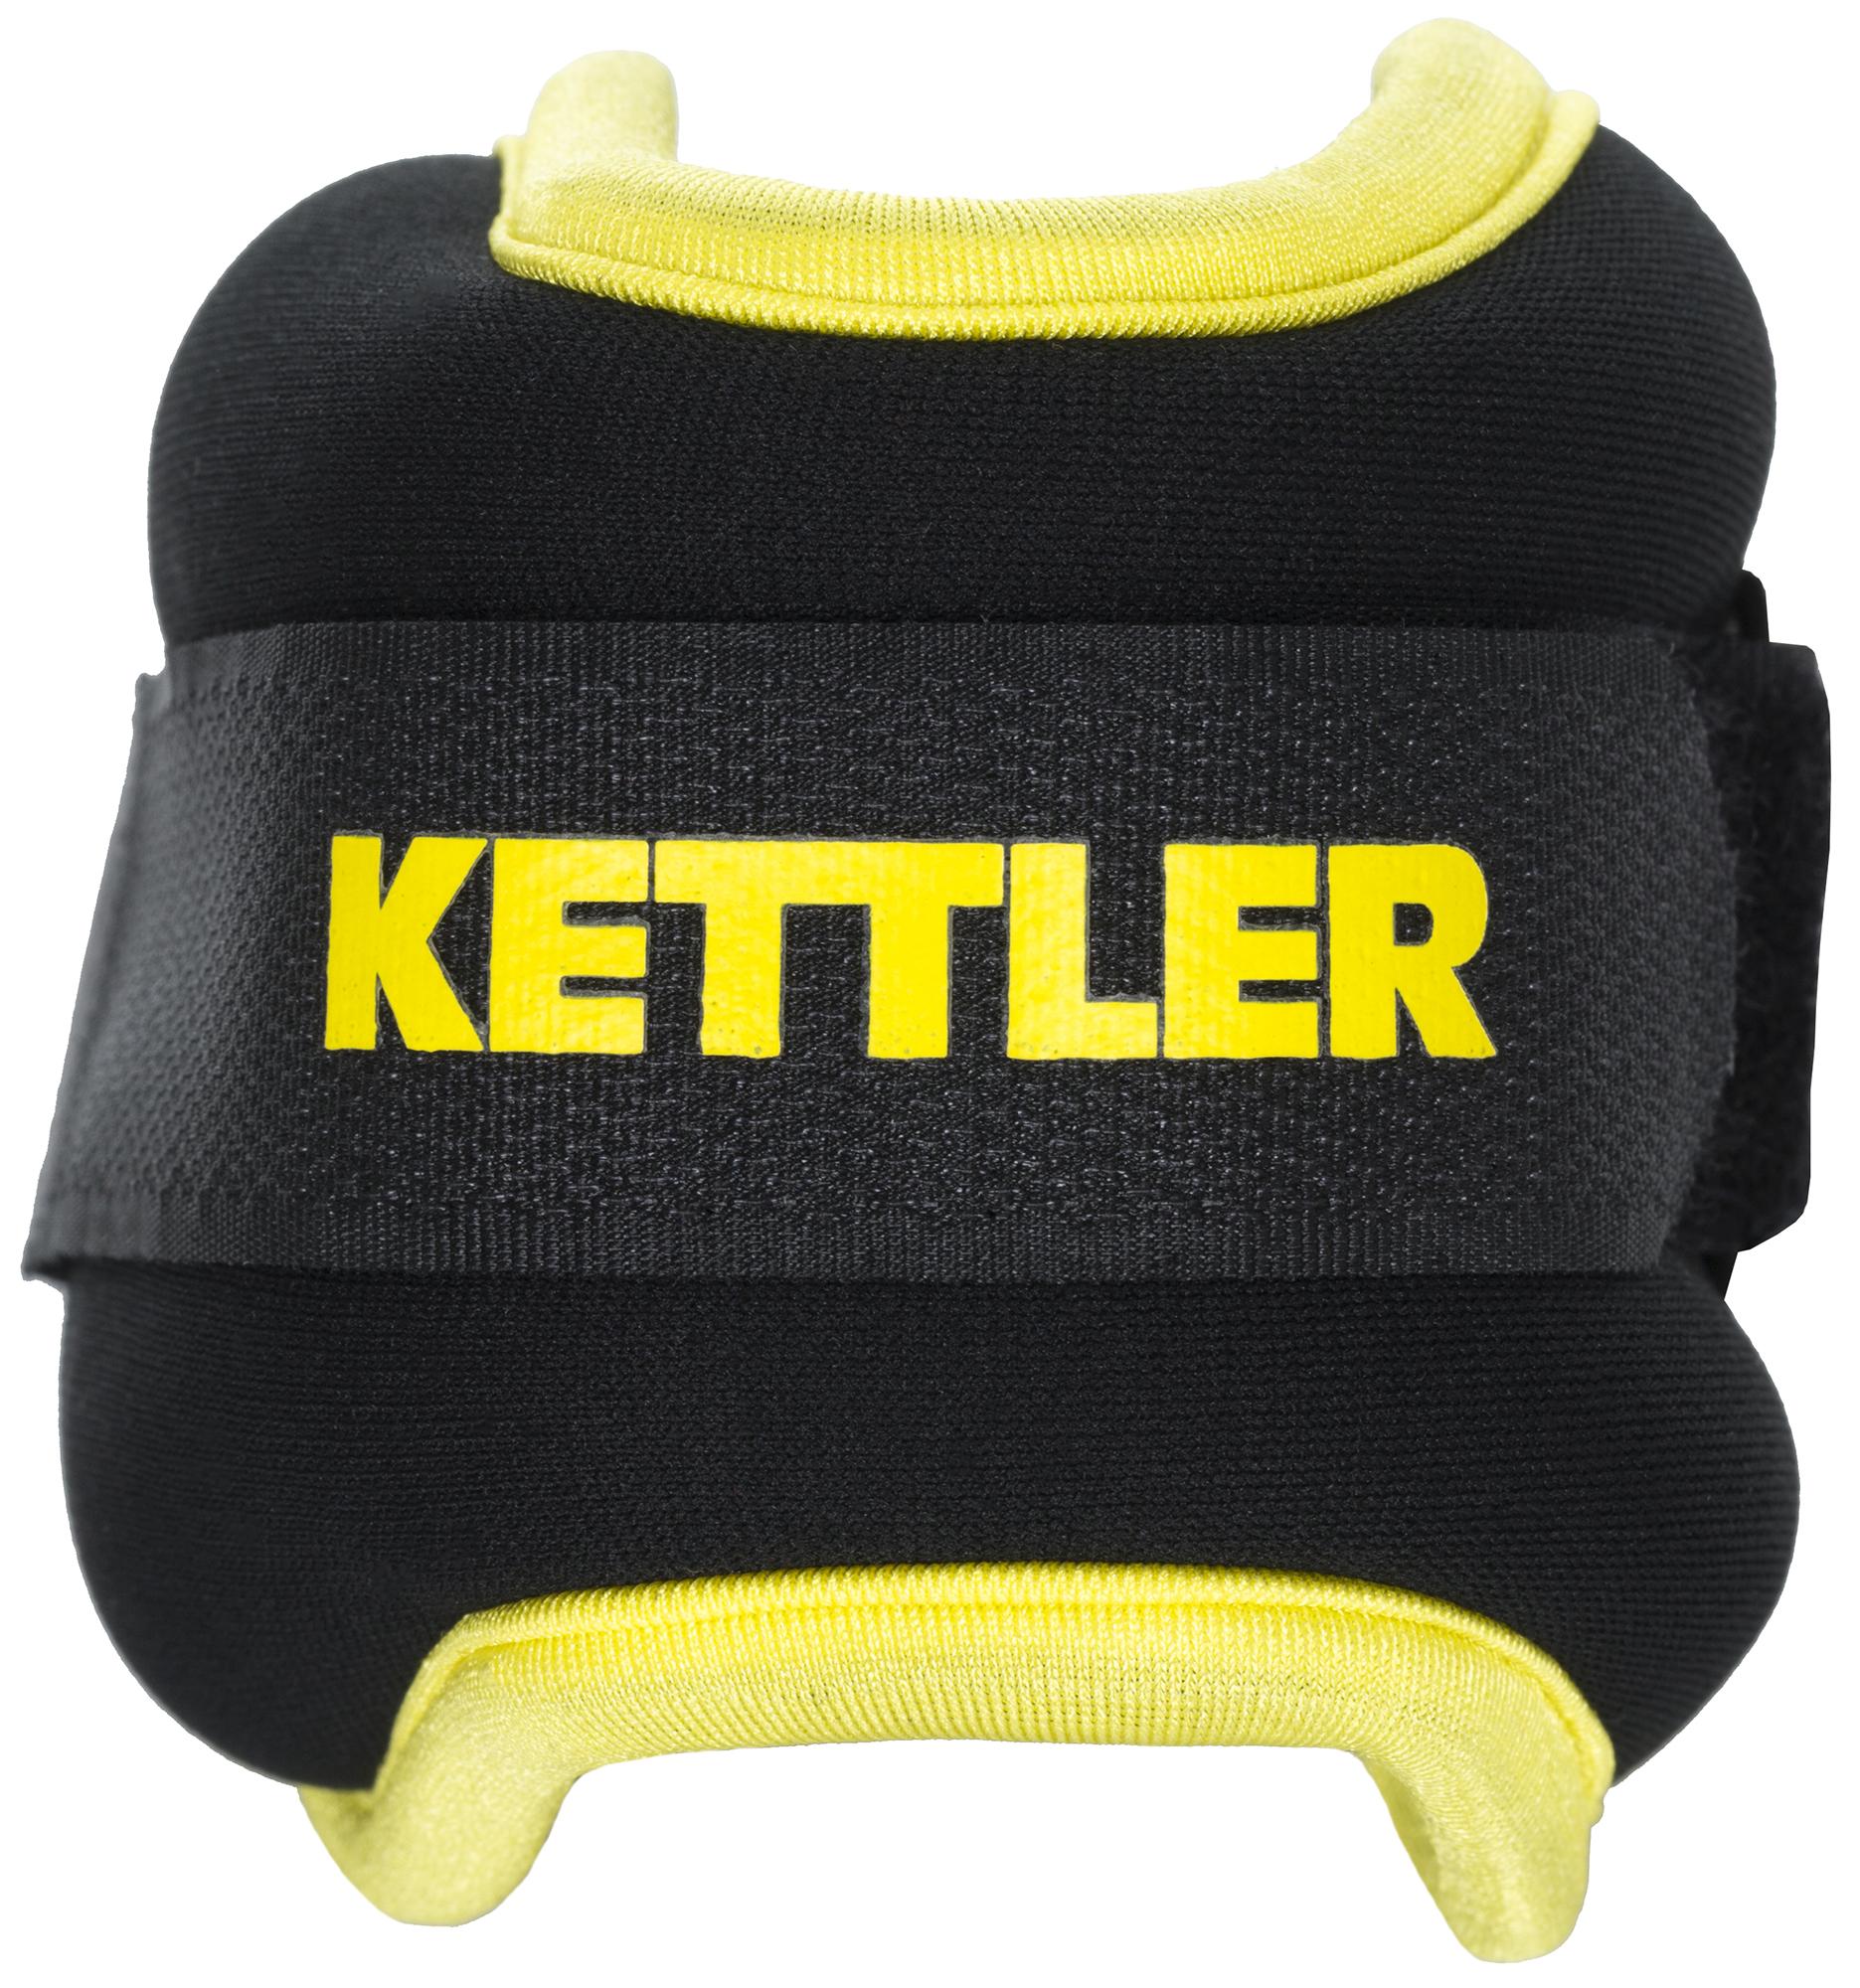 Kettler Утяжелители, Kettler 2 х 0,5 кг утяжелители atemi цвет черный 2 х 2 кг